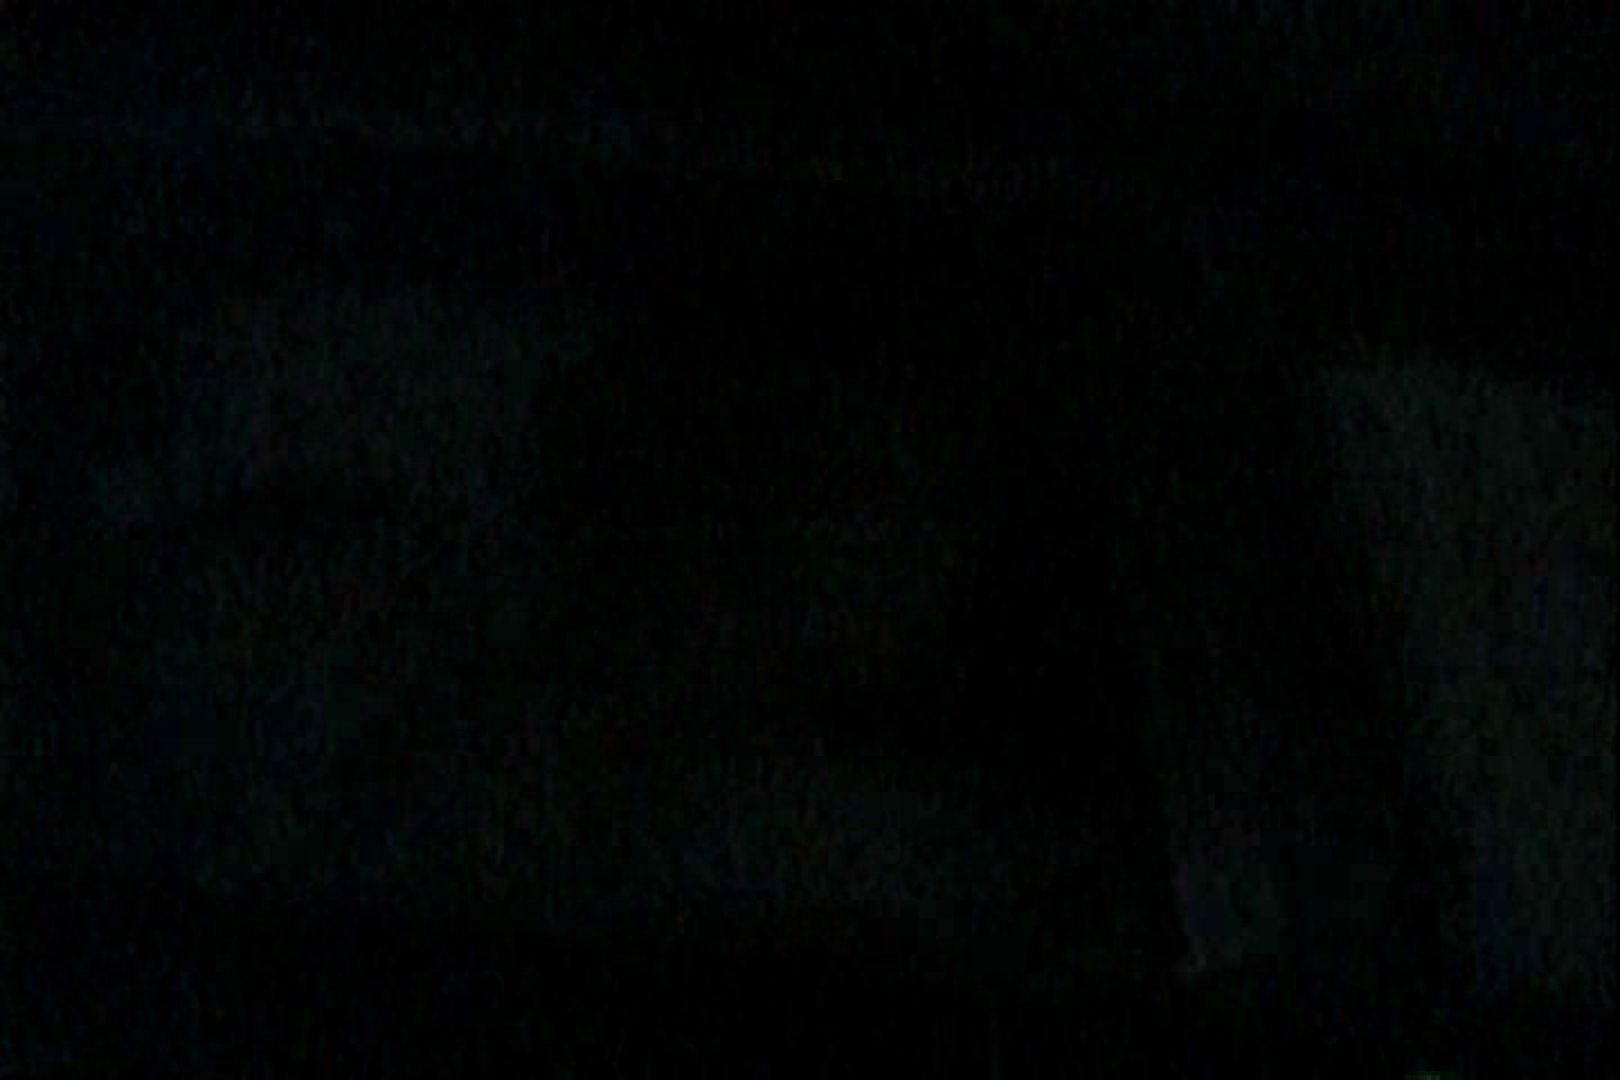 充血監督の深夜の運動会Vol.129 0  81連発 70